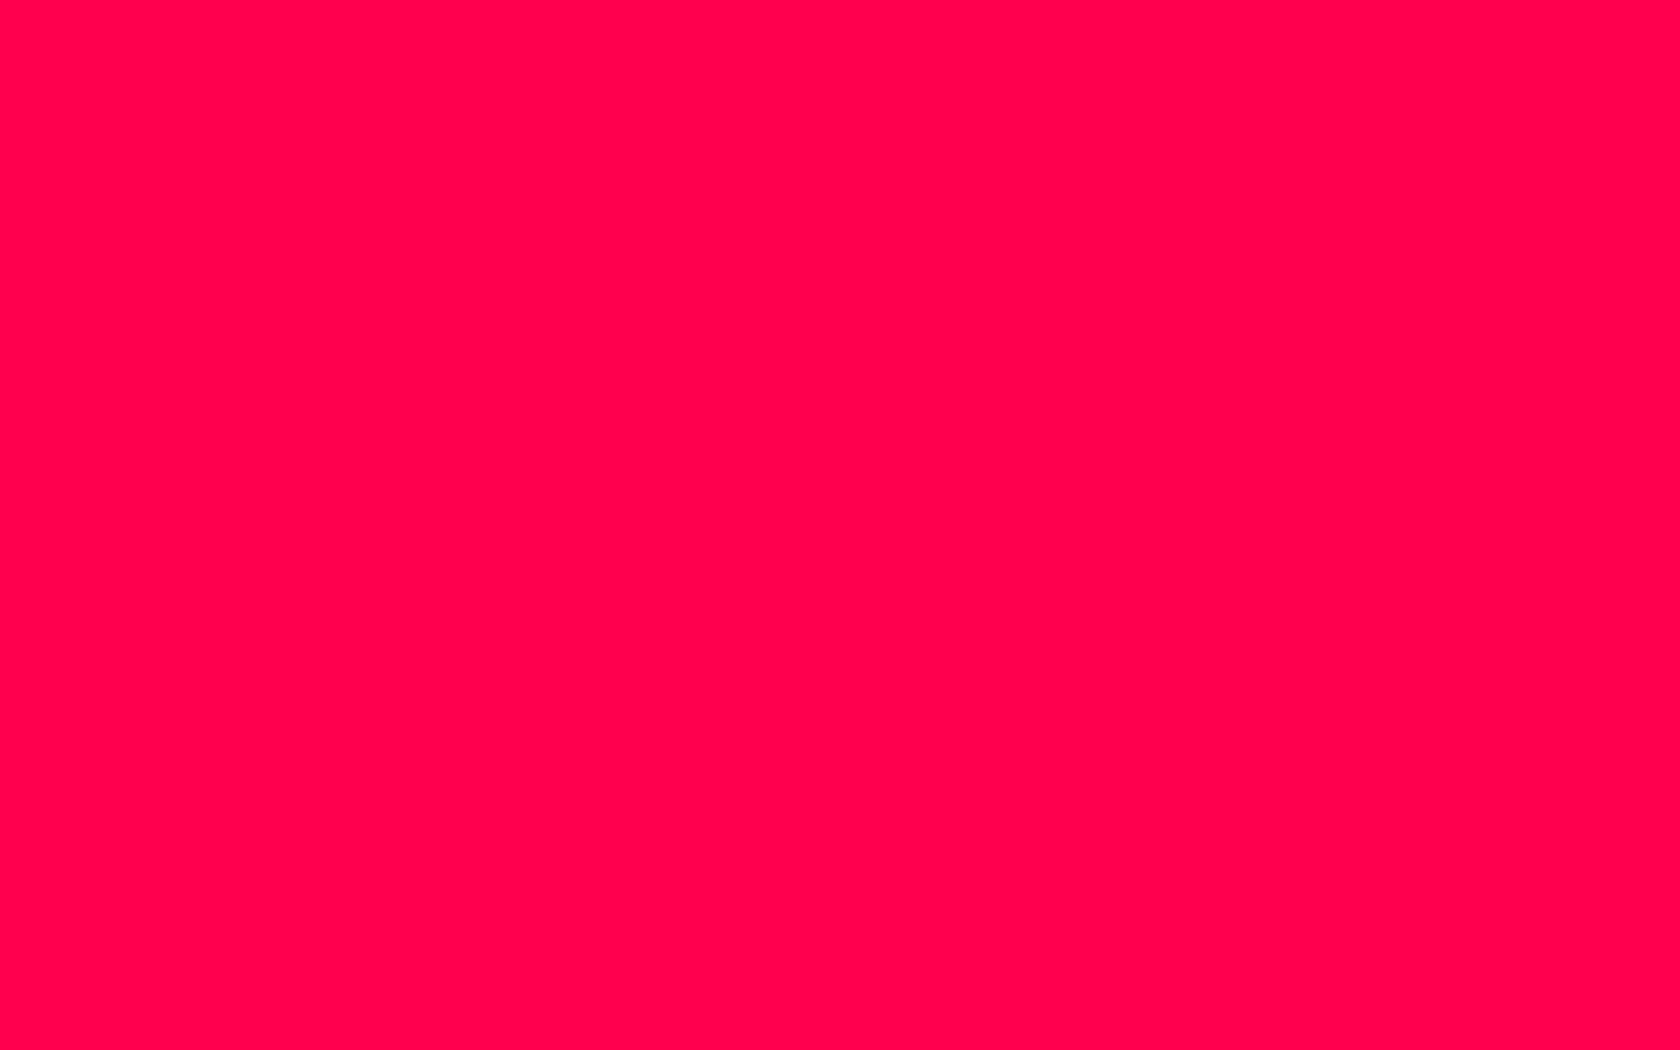 Solid Color Desktop Wallpaper Colorful Pictures 1680x1050